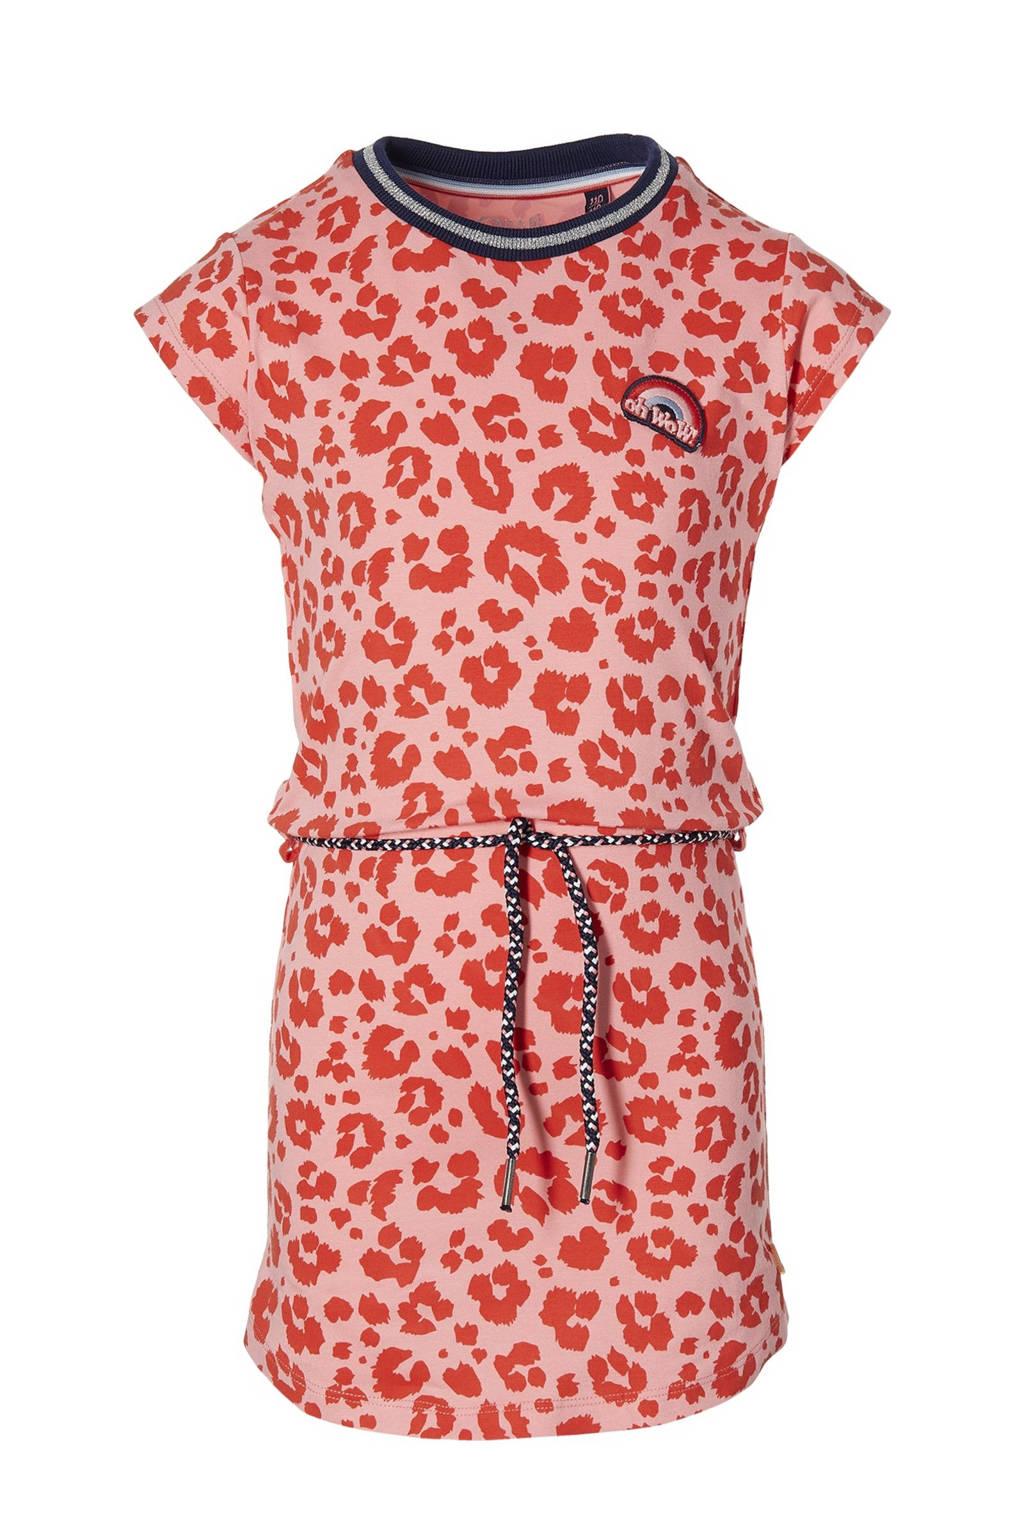 Quapi Girls jurk Fab met panterprint roze/rood, Roze/rood